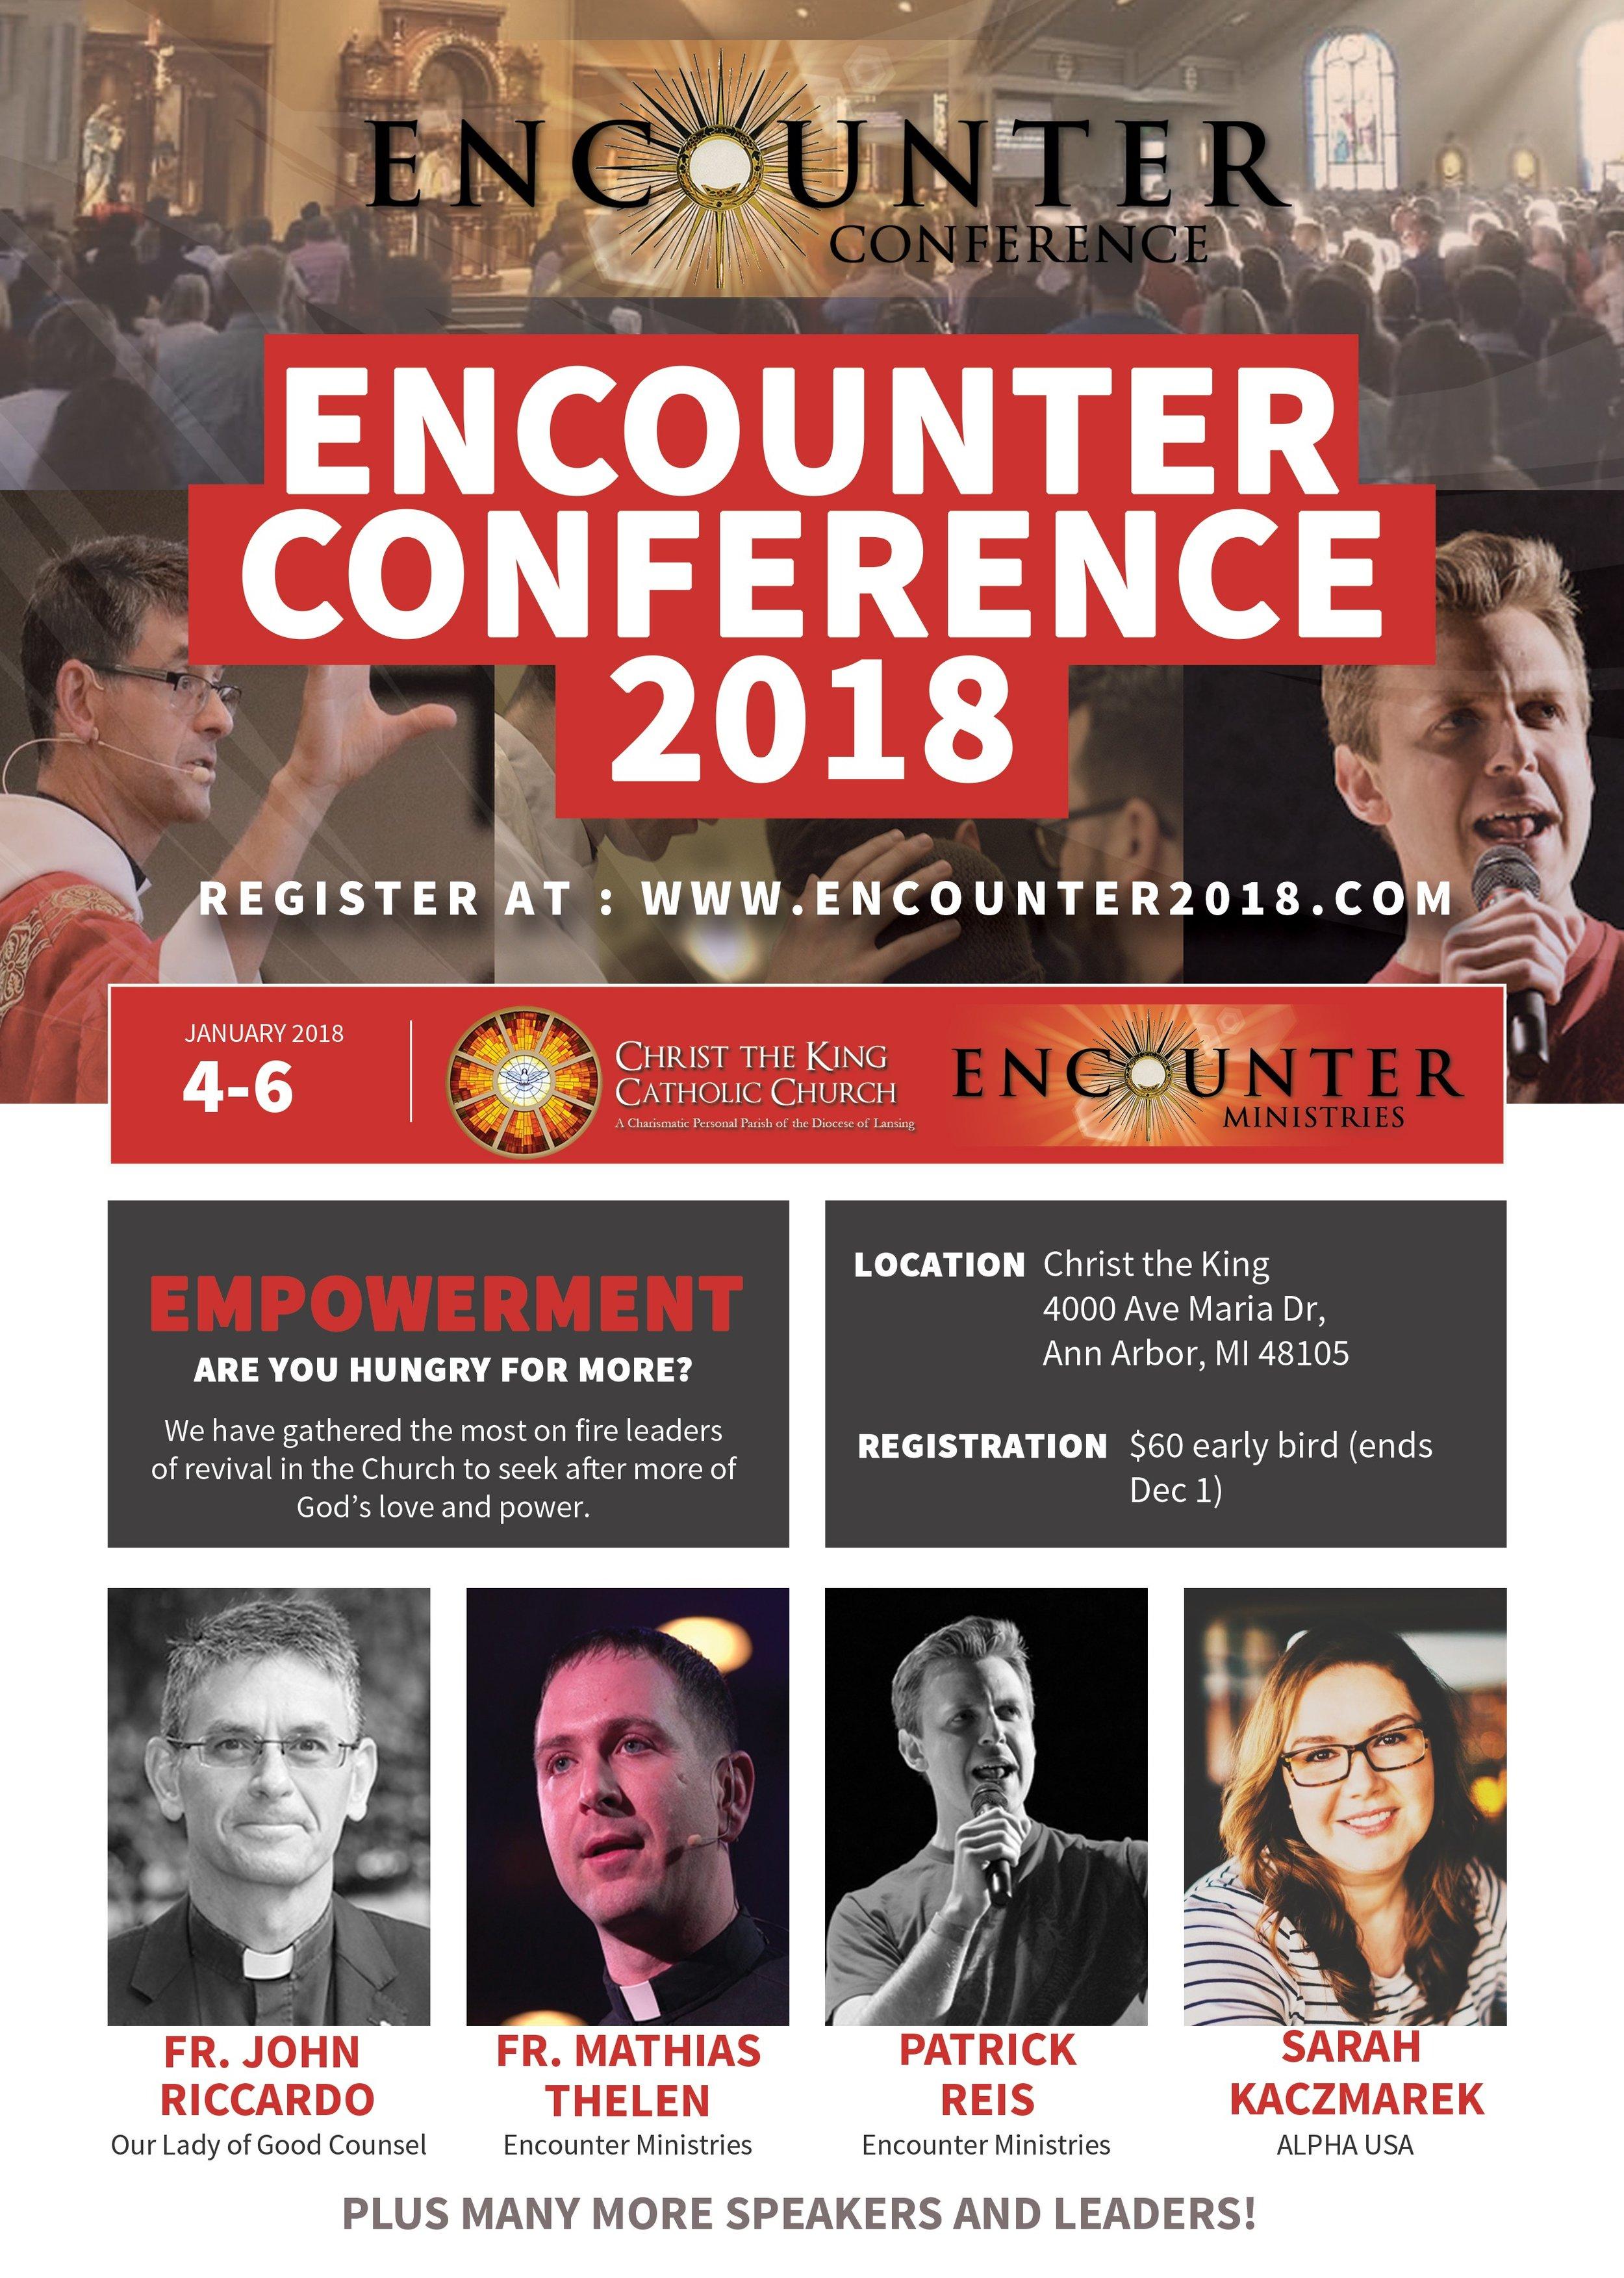 Encounter-2018-Flyer-Ann-Arbor.jpg